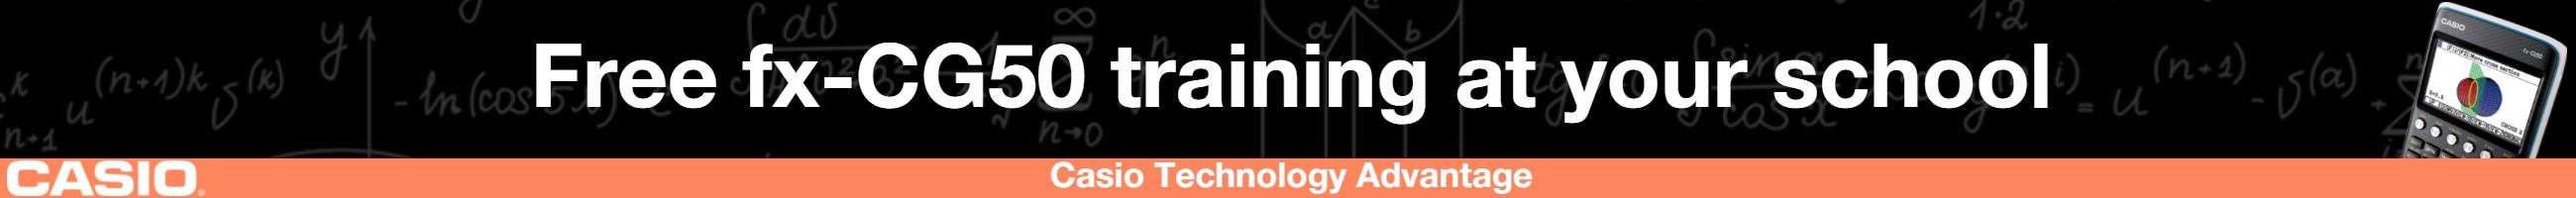 Training 2600 x 200.jpg